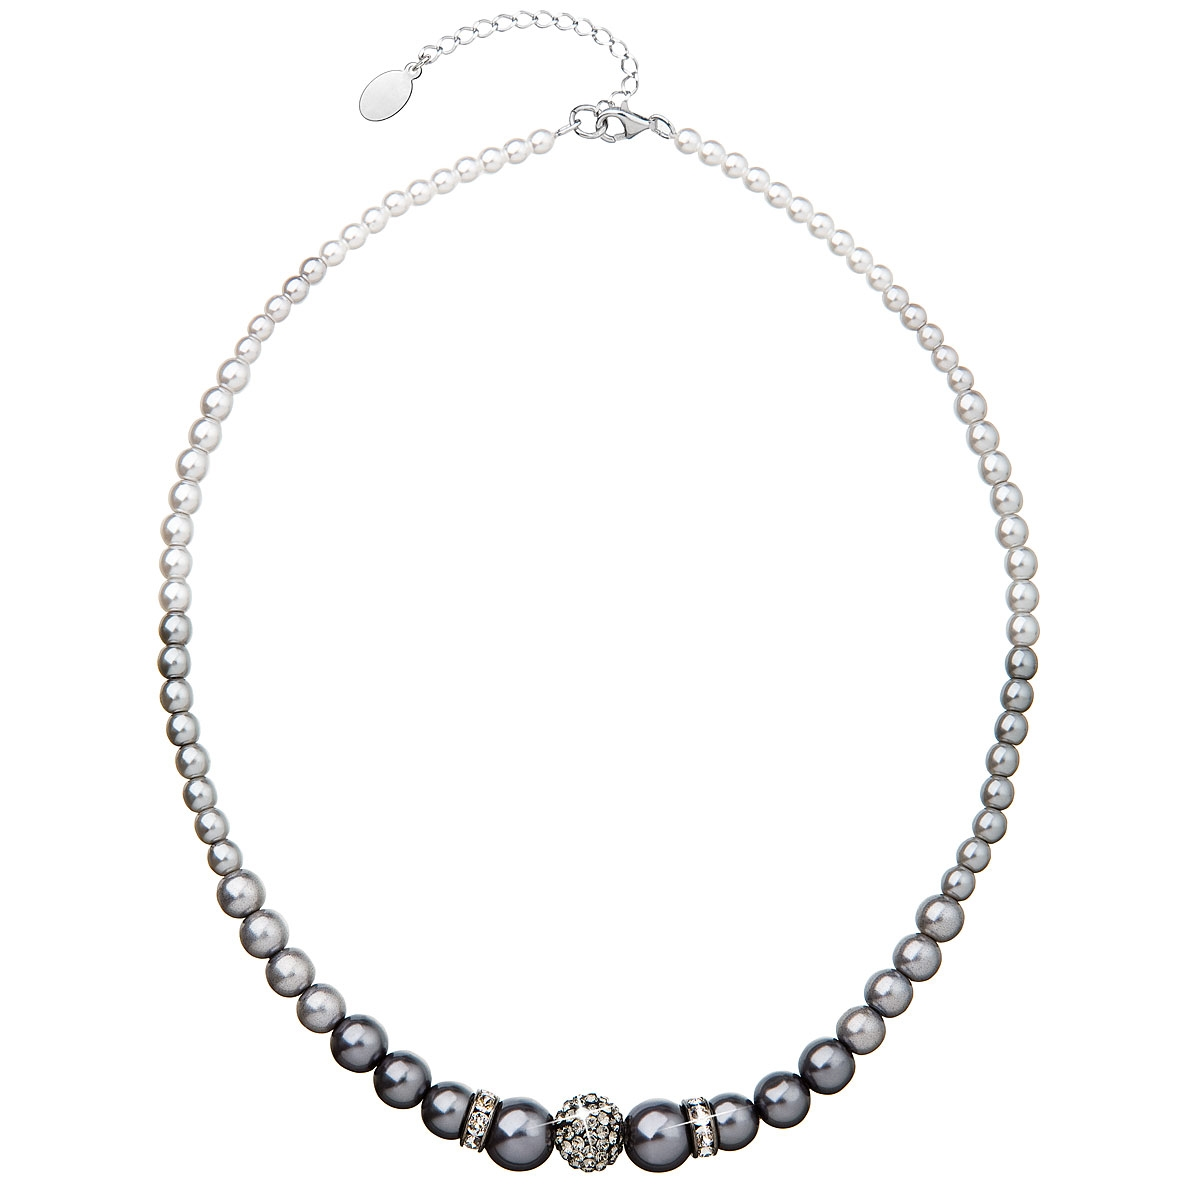 Šedý perlový náhrdelník Crystals from Swarovski® EG4033